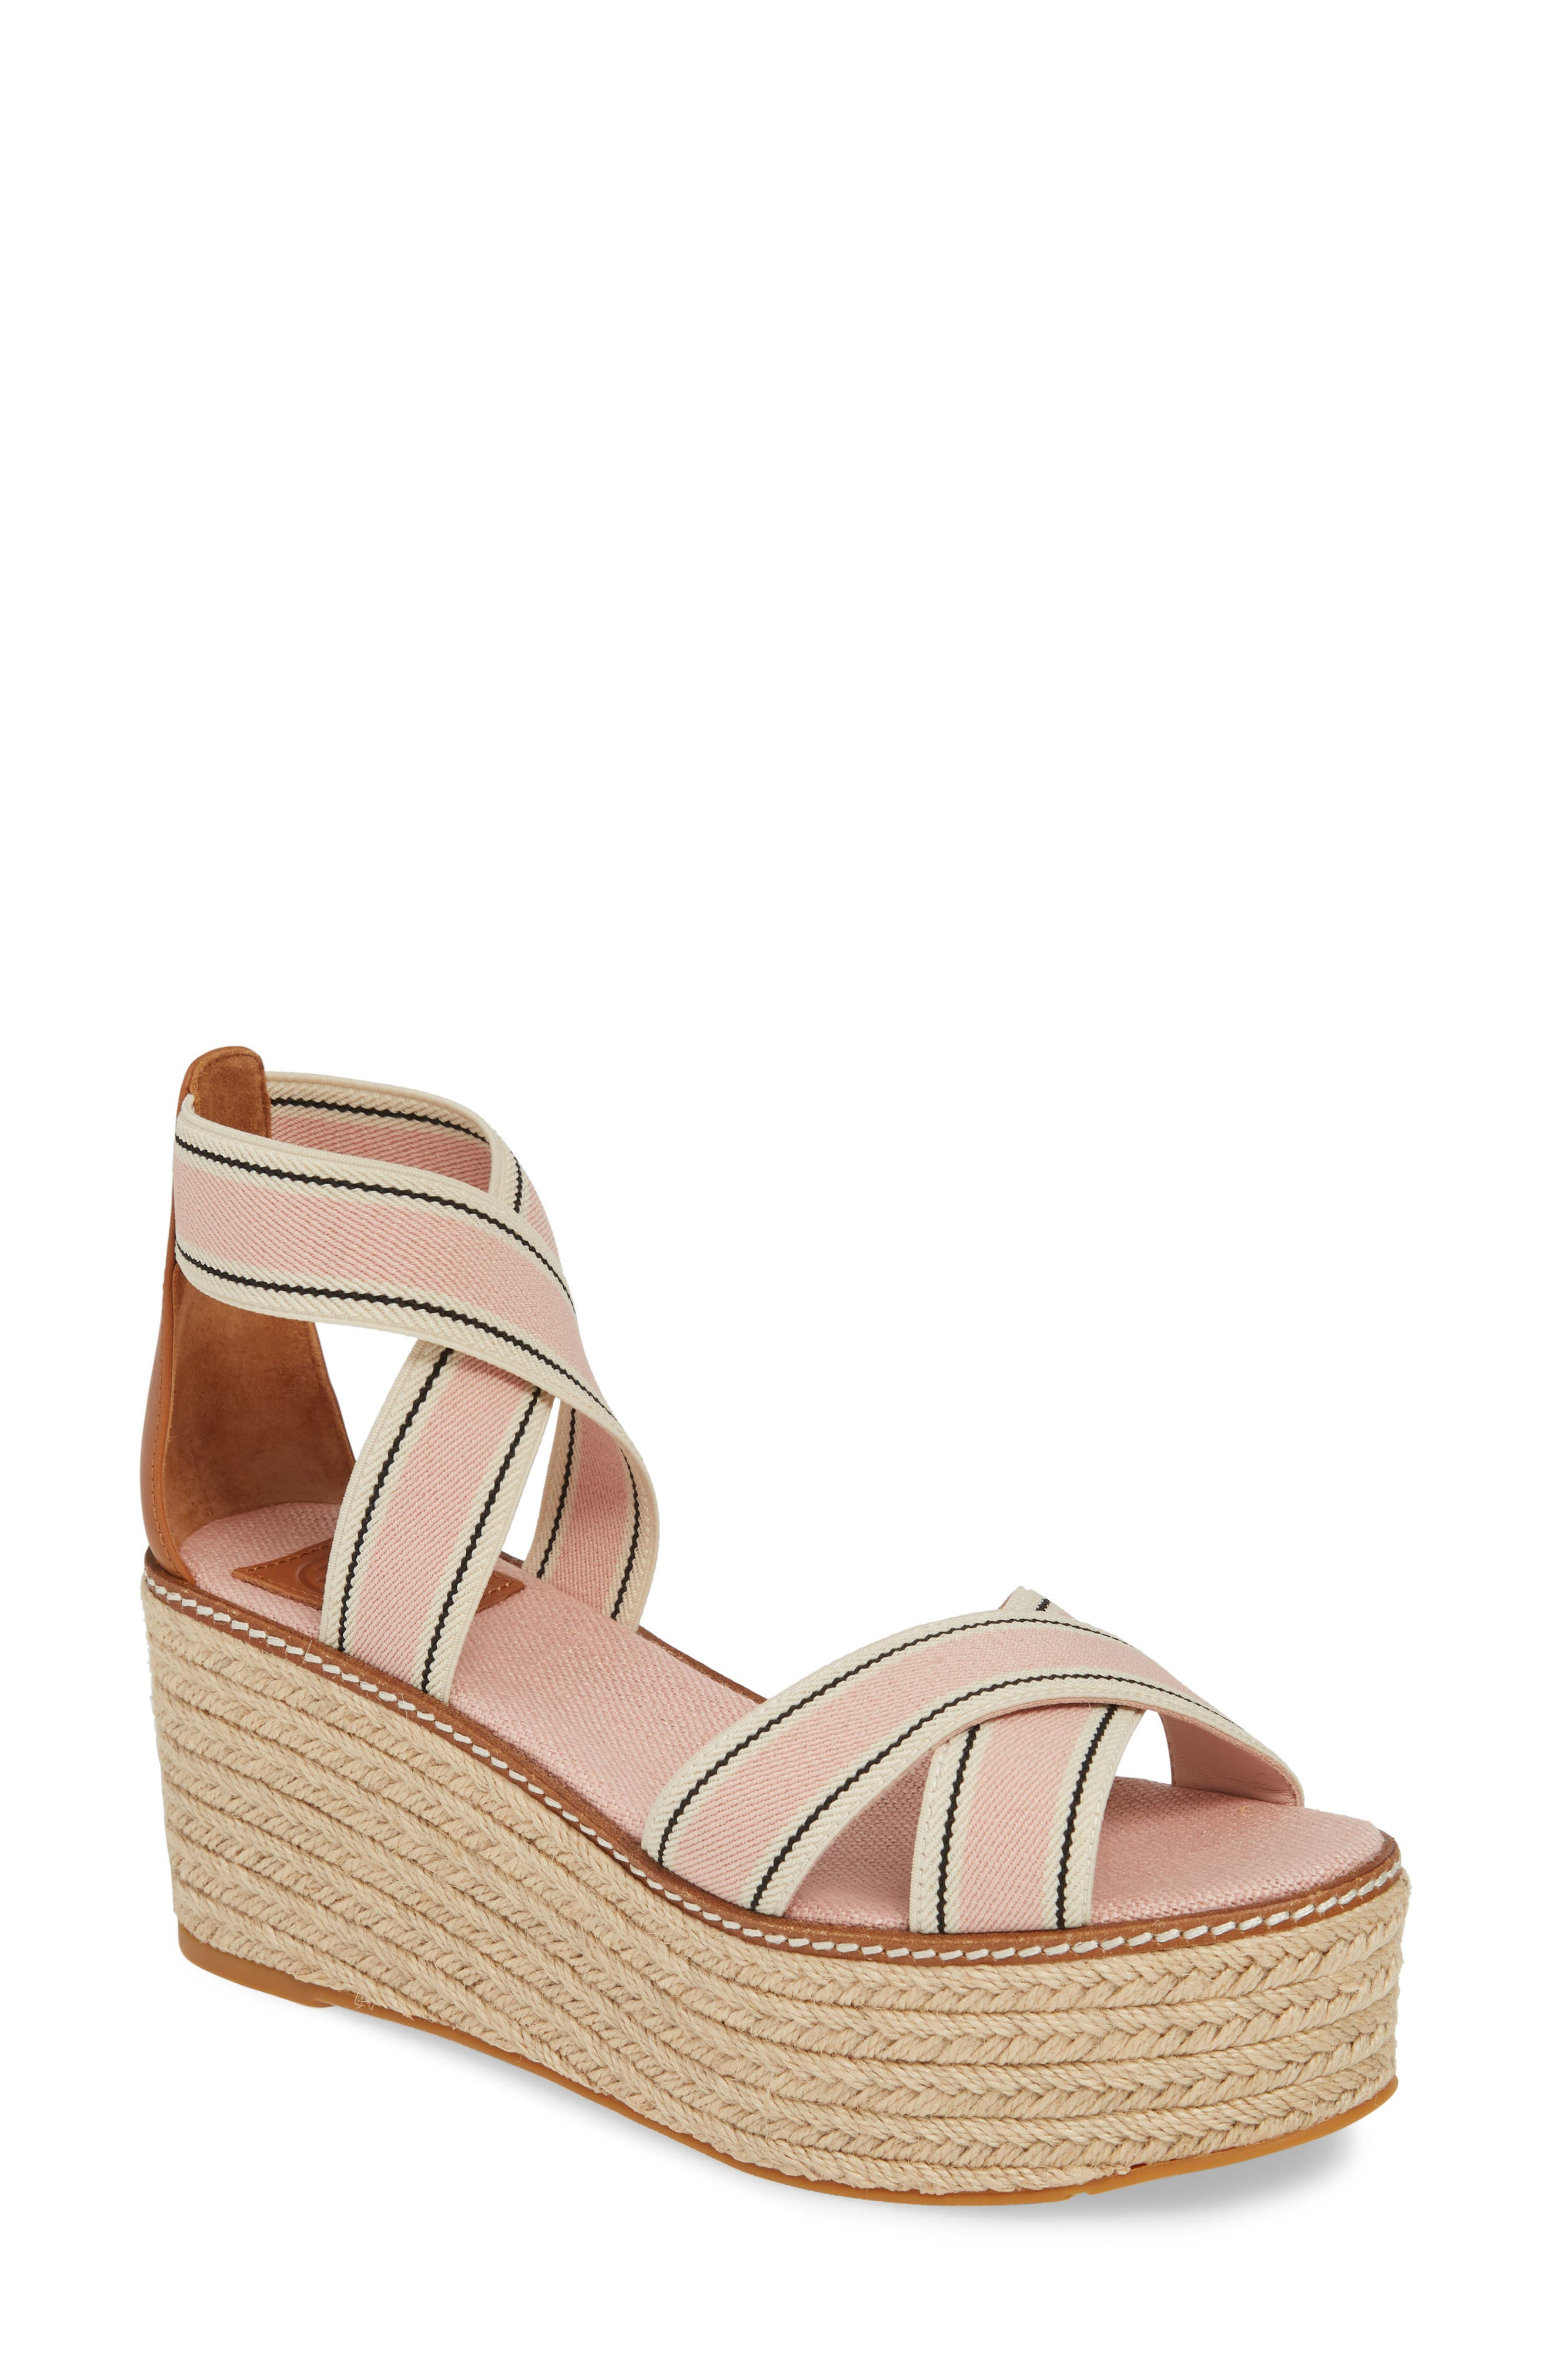 Tory Burch Frieda Espadrille Platform Sandal- Pink